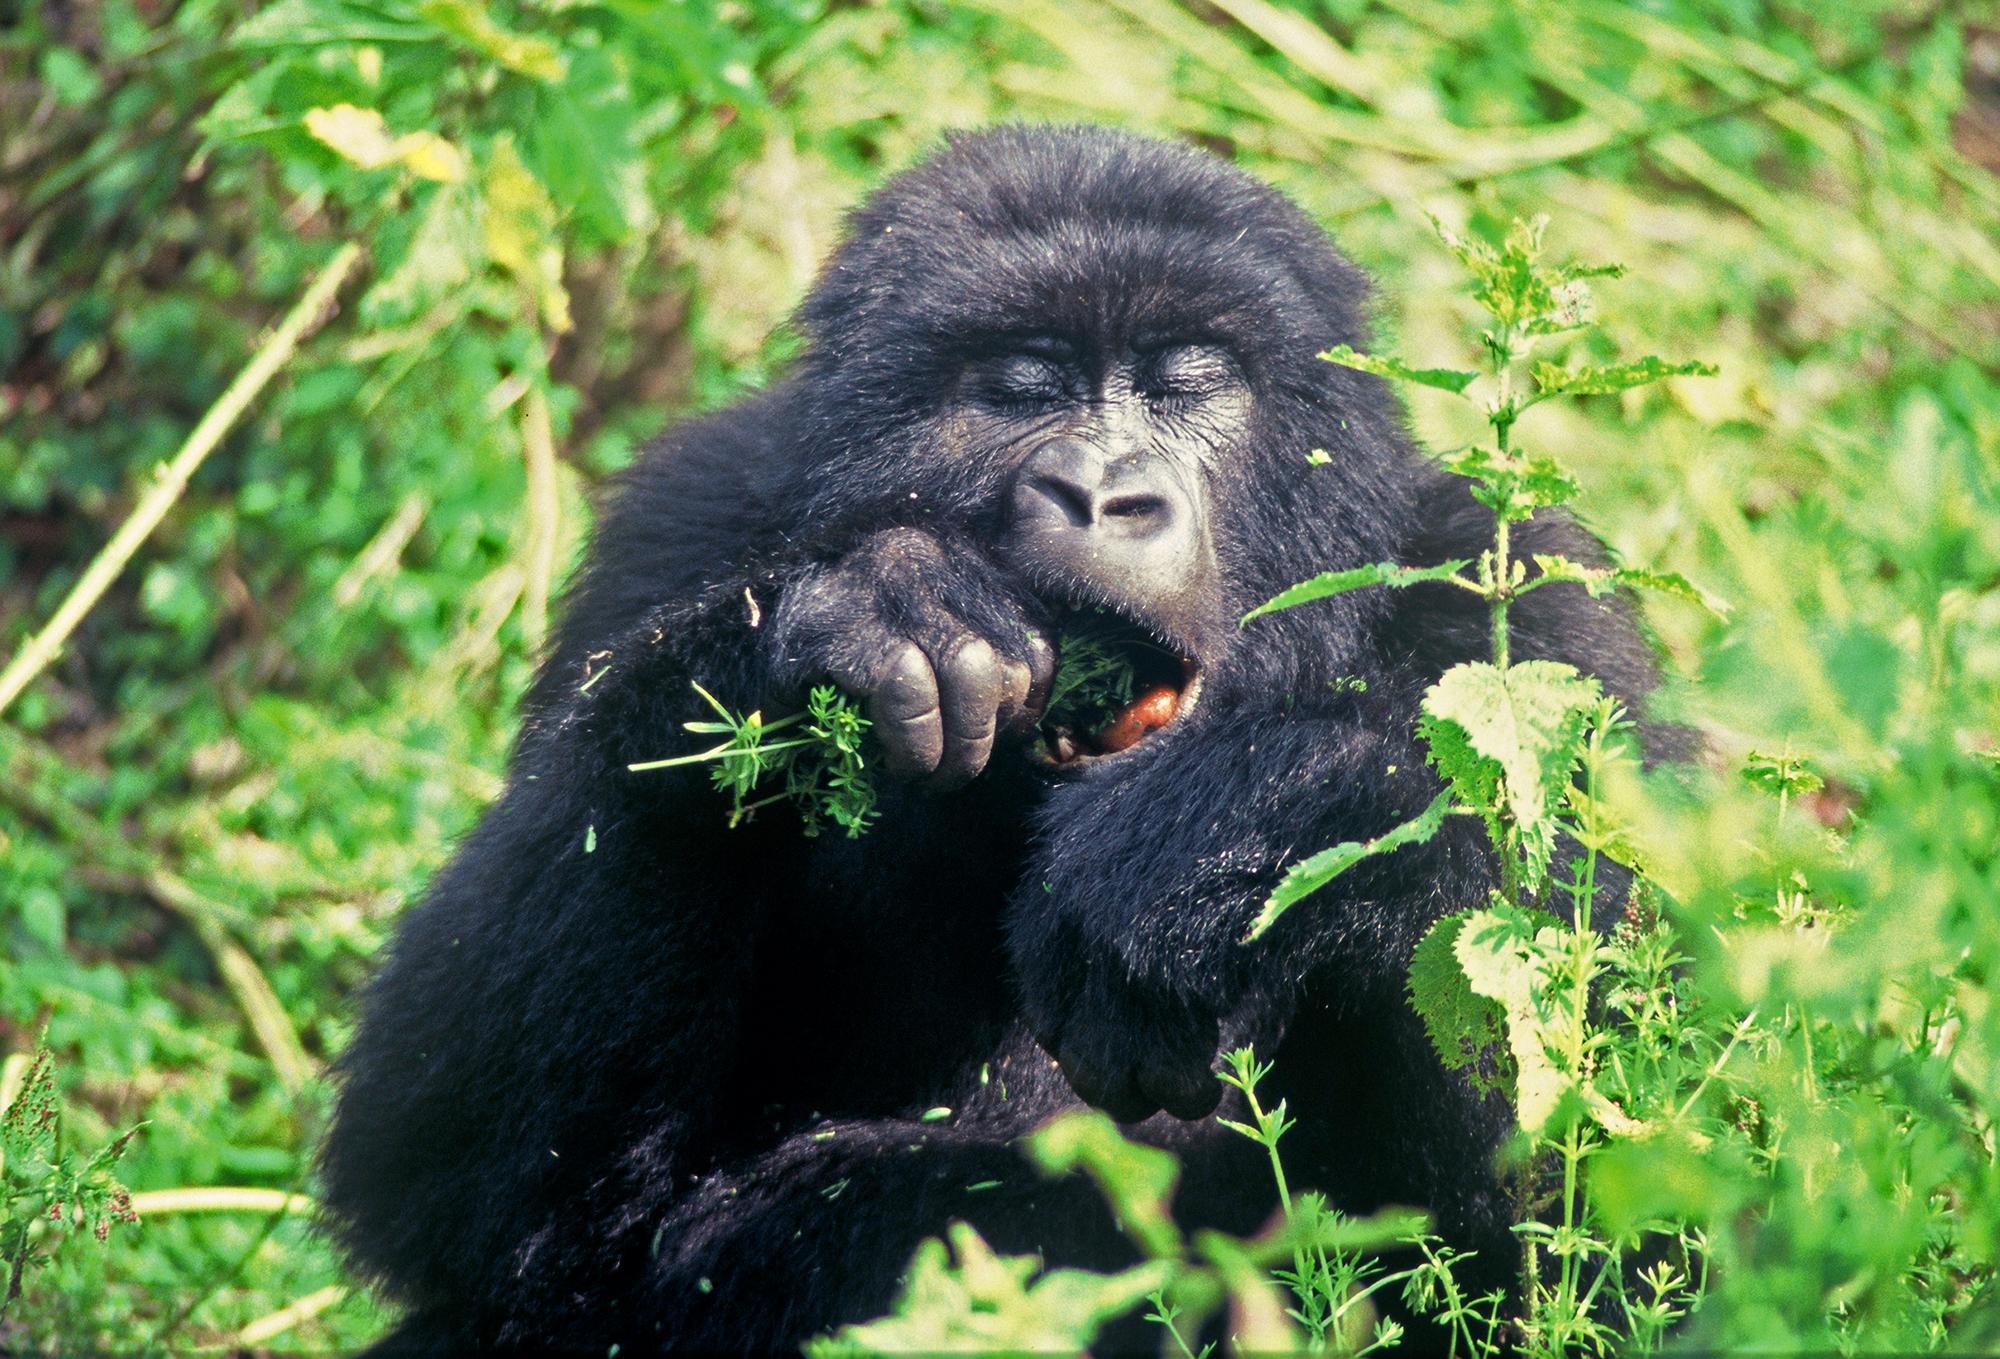 EATING CELERY (Gorilla gorilla beringei)